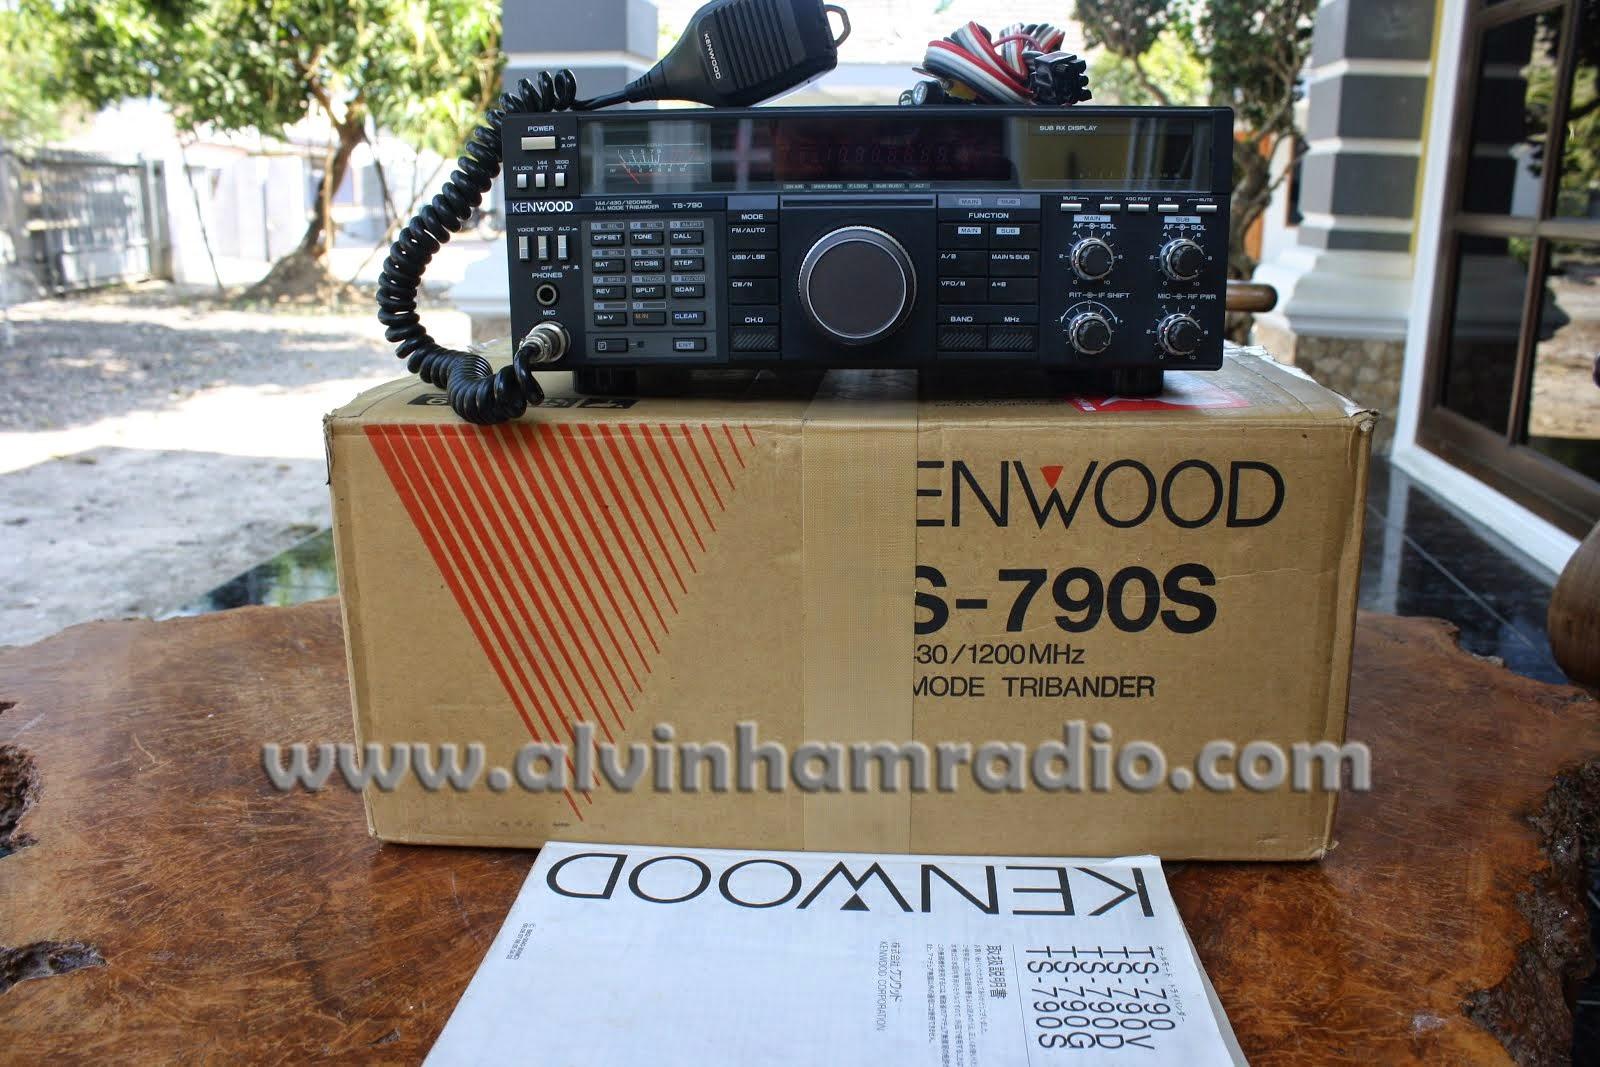 TRIBANDER KENWOOD TS - 790S